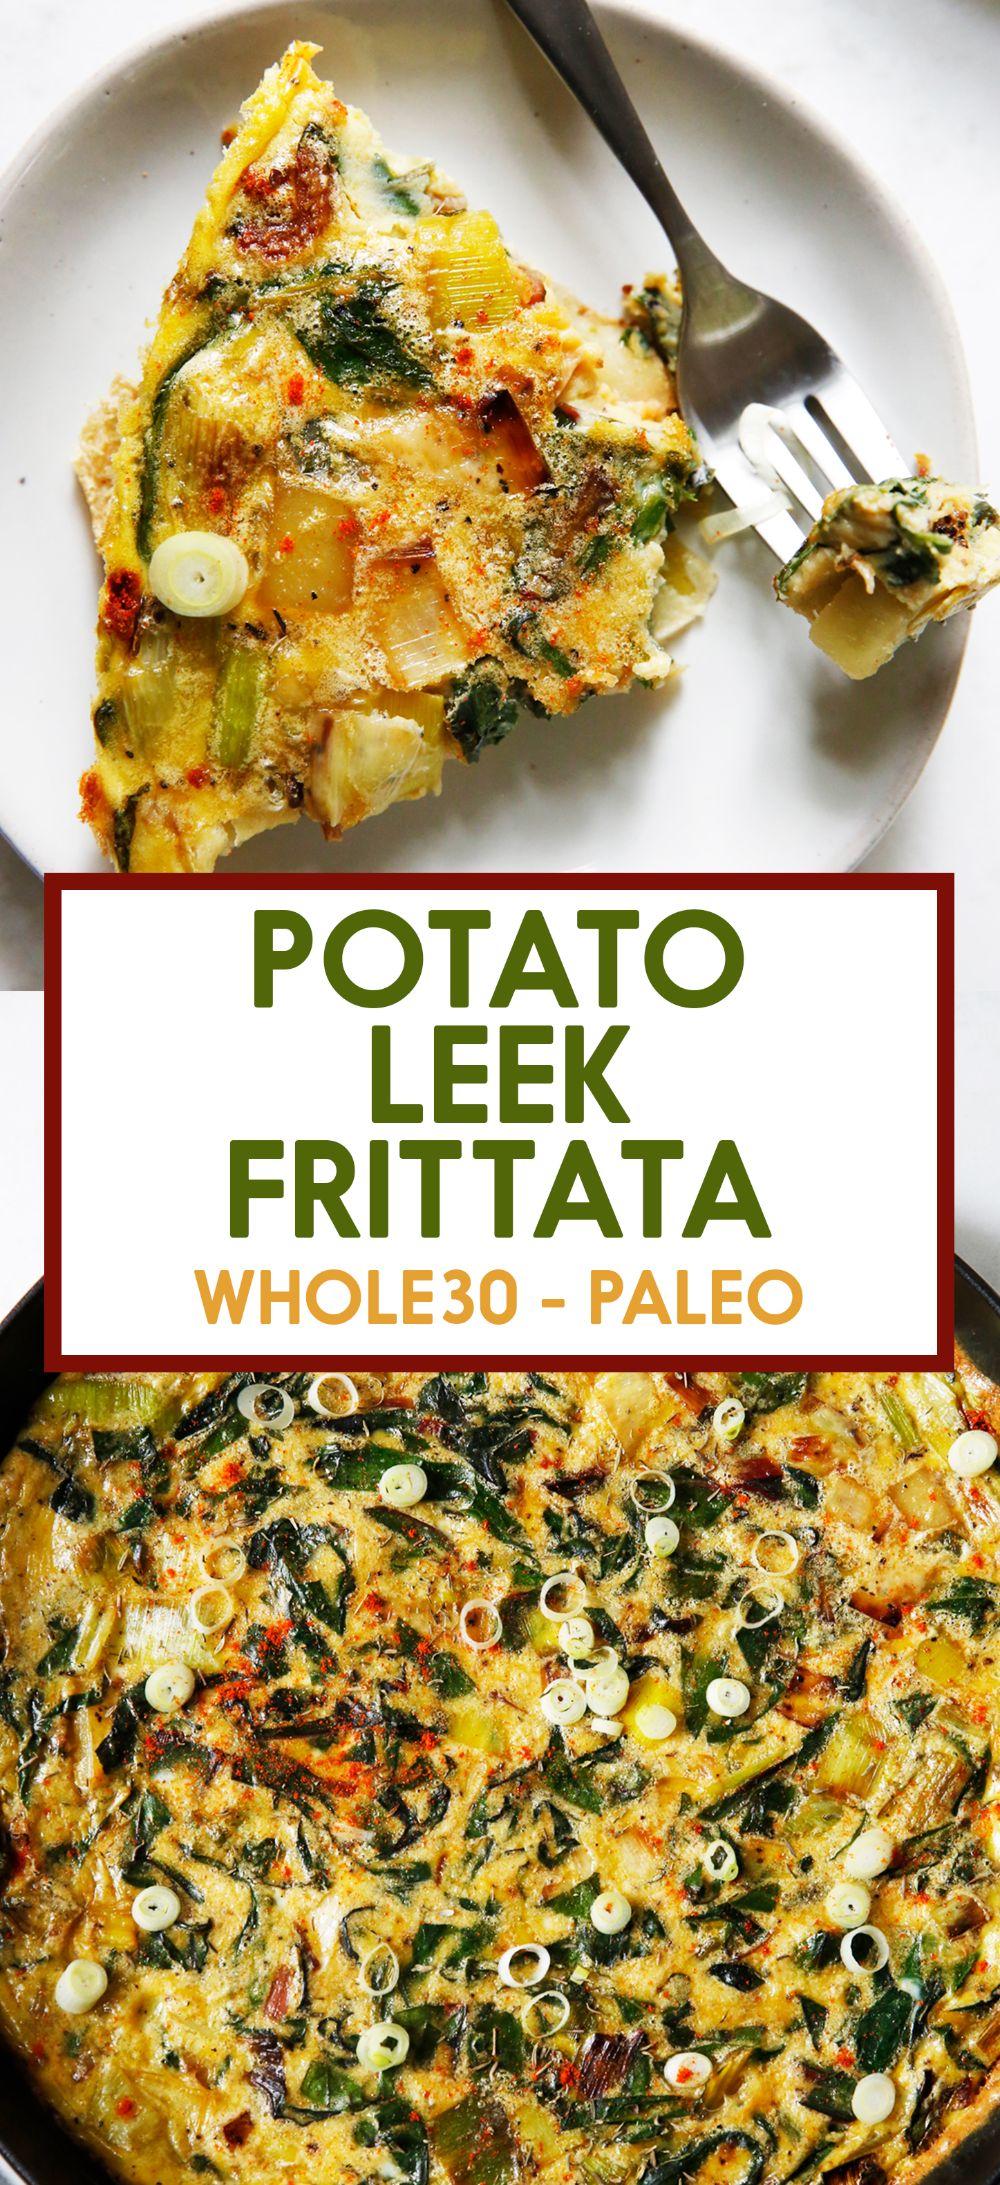 Chard and Potato Leek Frittata - Lexi's Clean Kitchen